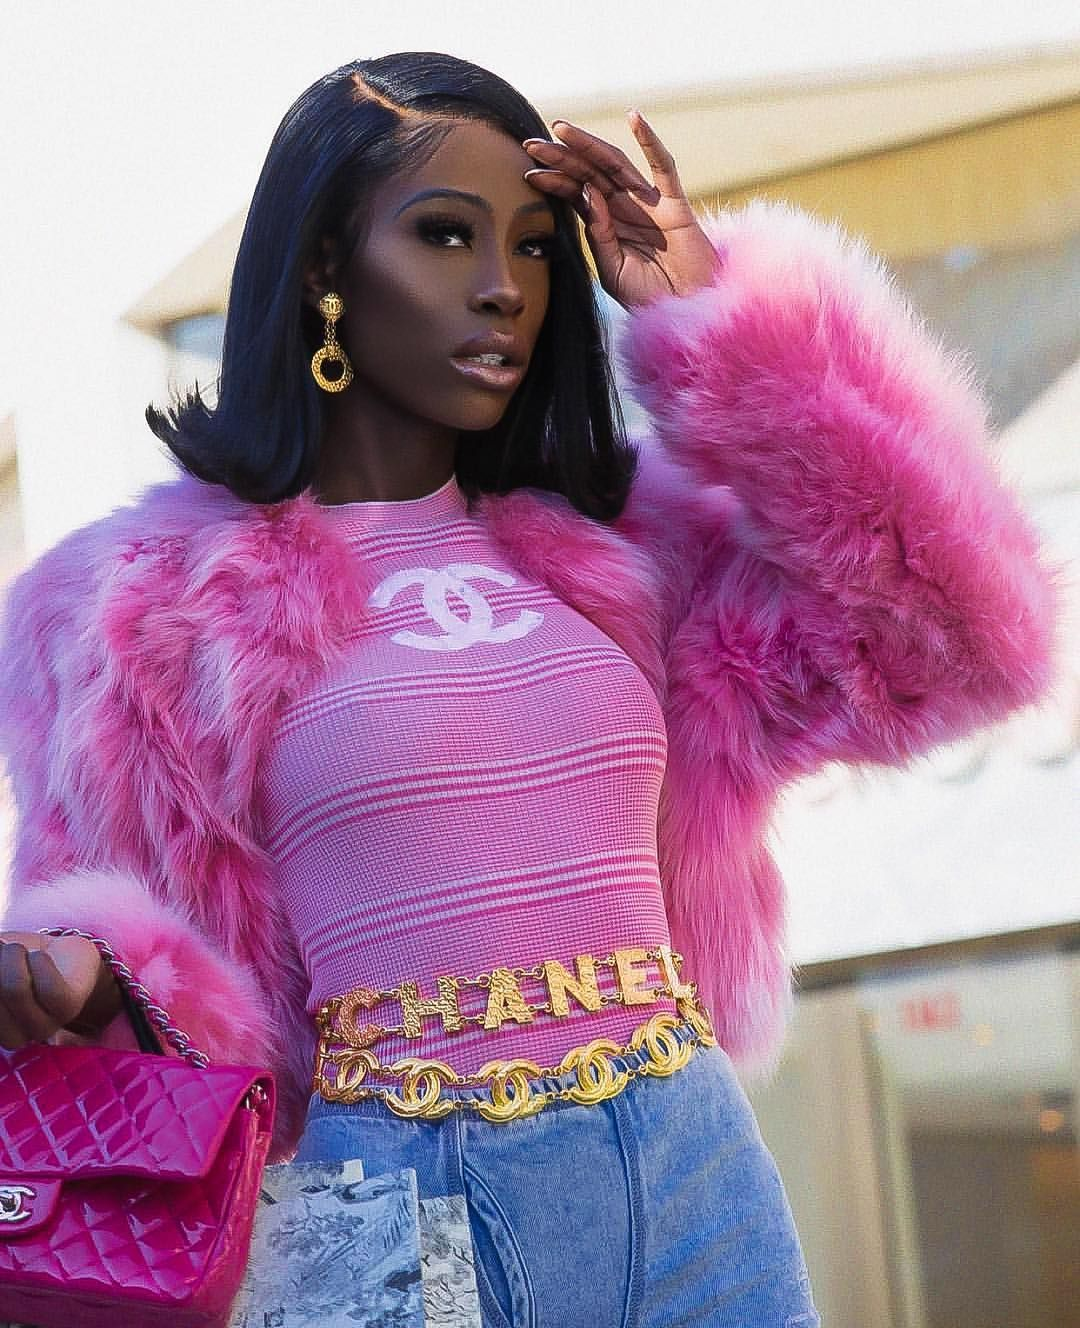 California Black Girl Fashion: 𝒮𝒽𝑒 𝒲𝒶𝓃𝓉 𝒞𝒽𝒶𝓃𝑒𝓁 𝒢𝑜 𝒢𝑒𝓉 𝒾𝓉💕 #fashion #fashionable